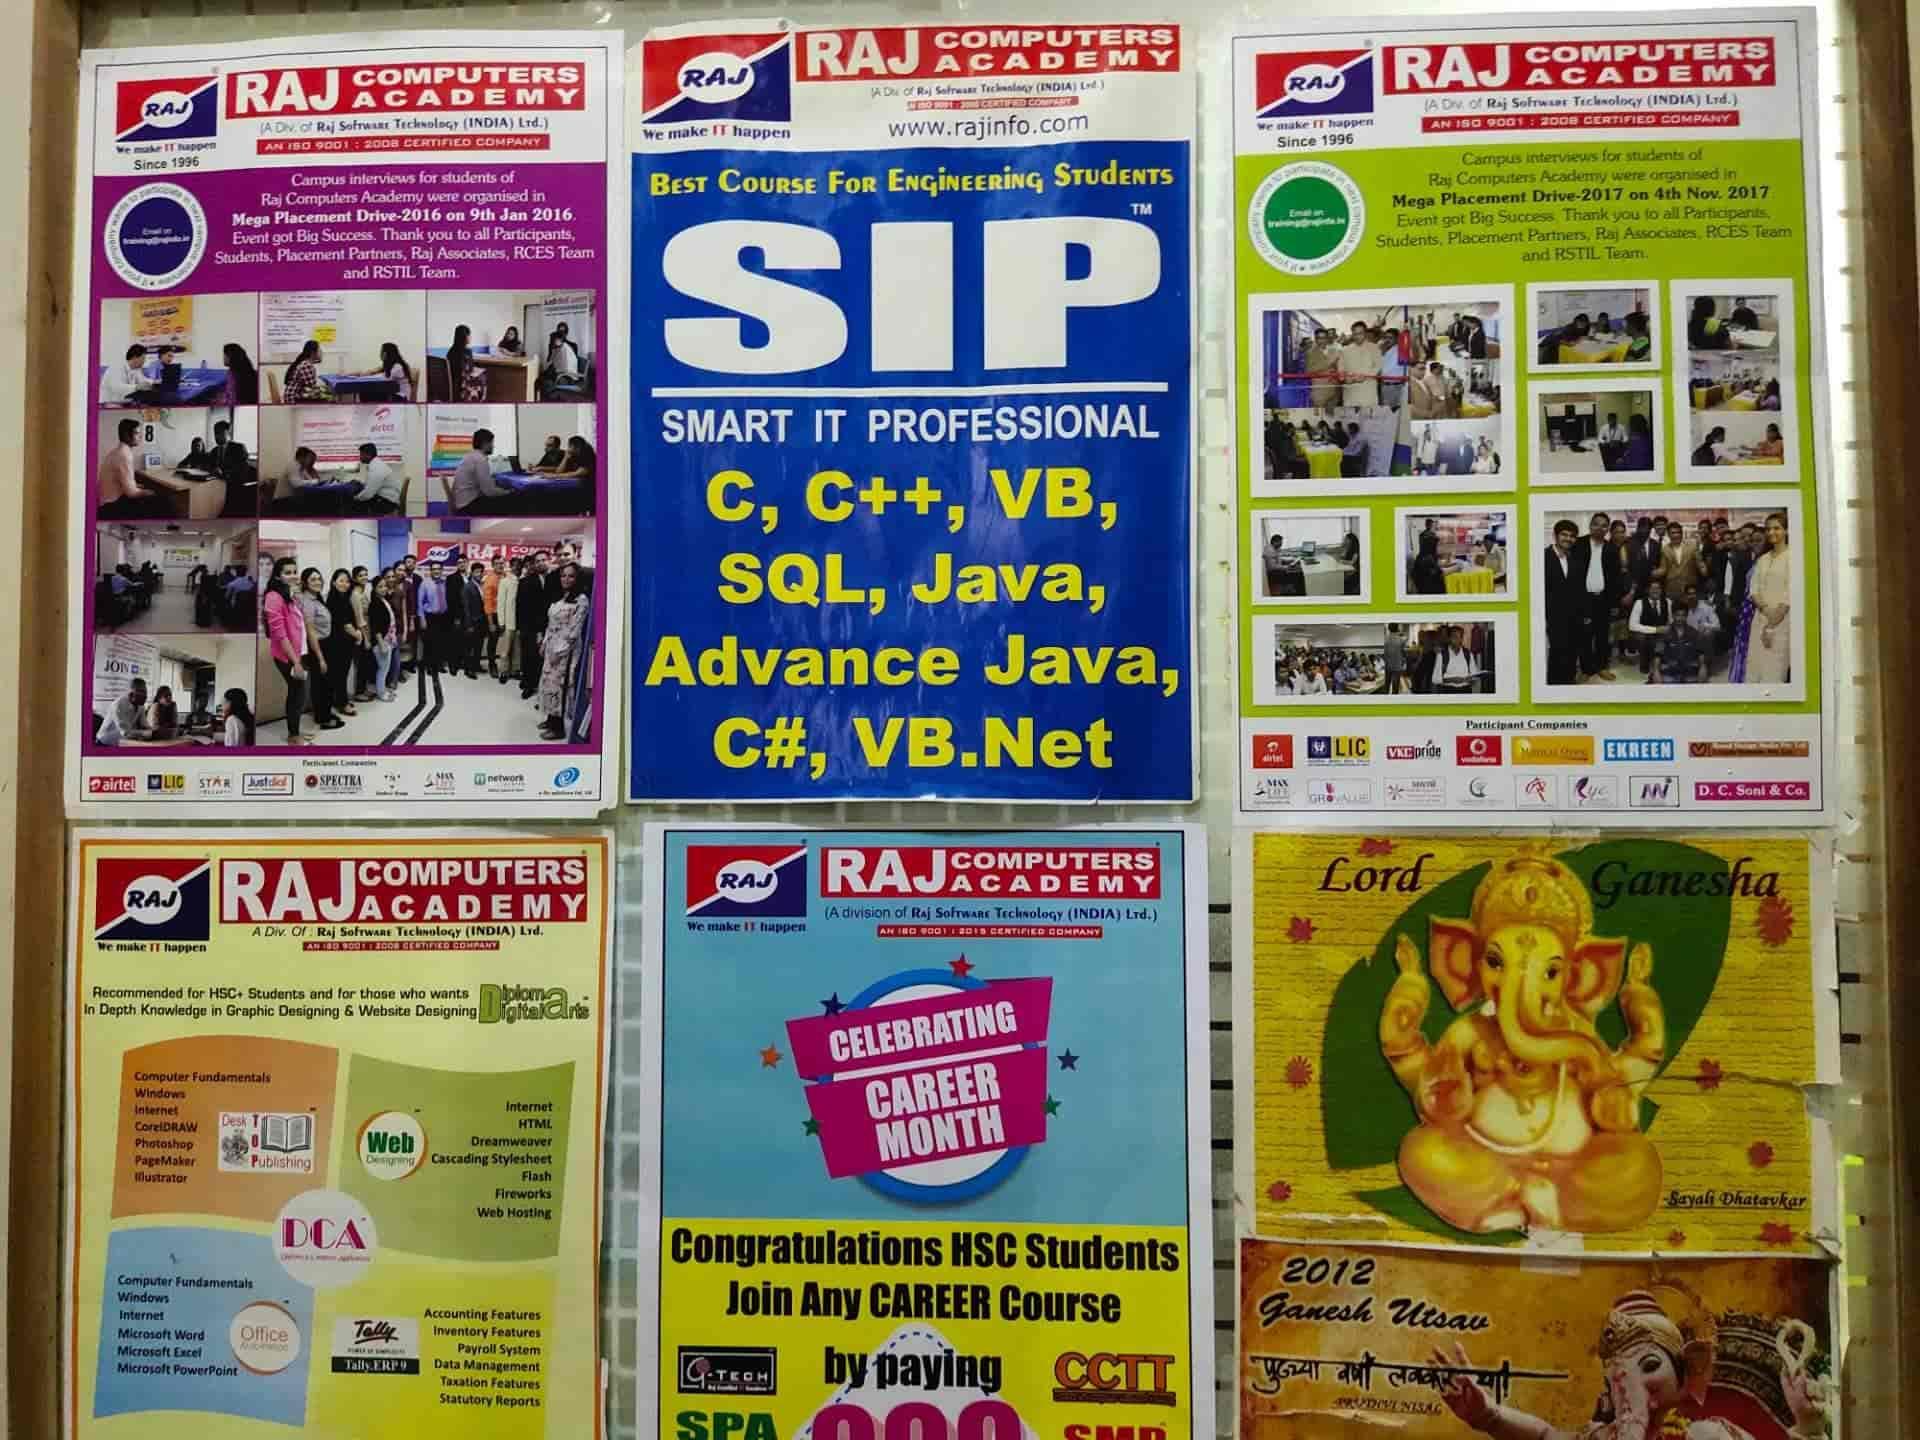 Raj Computers Academy, Andheri East - Computer Training